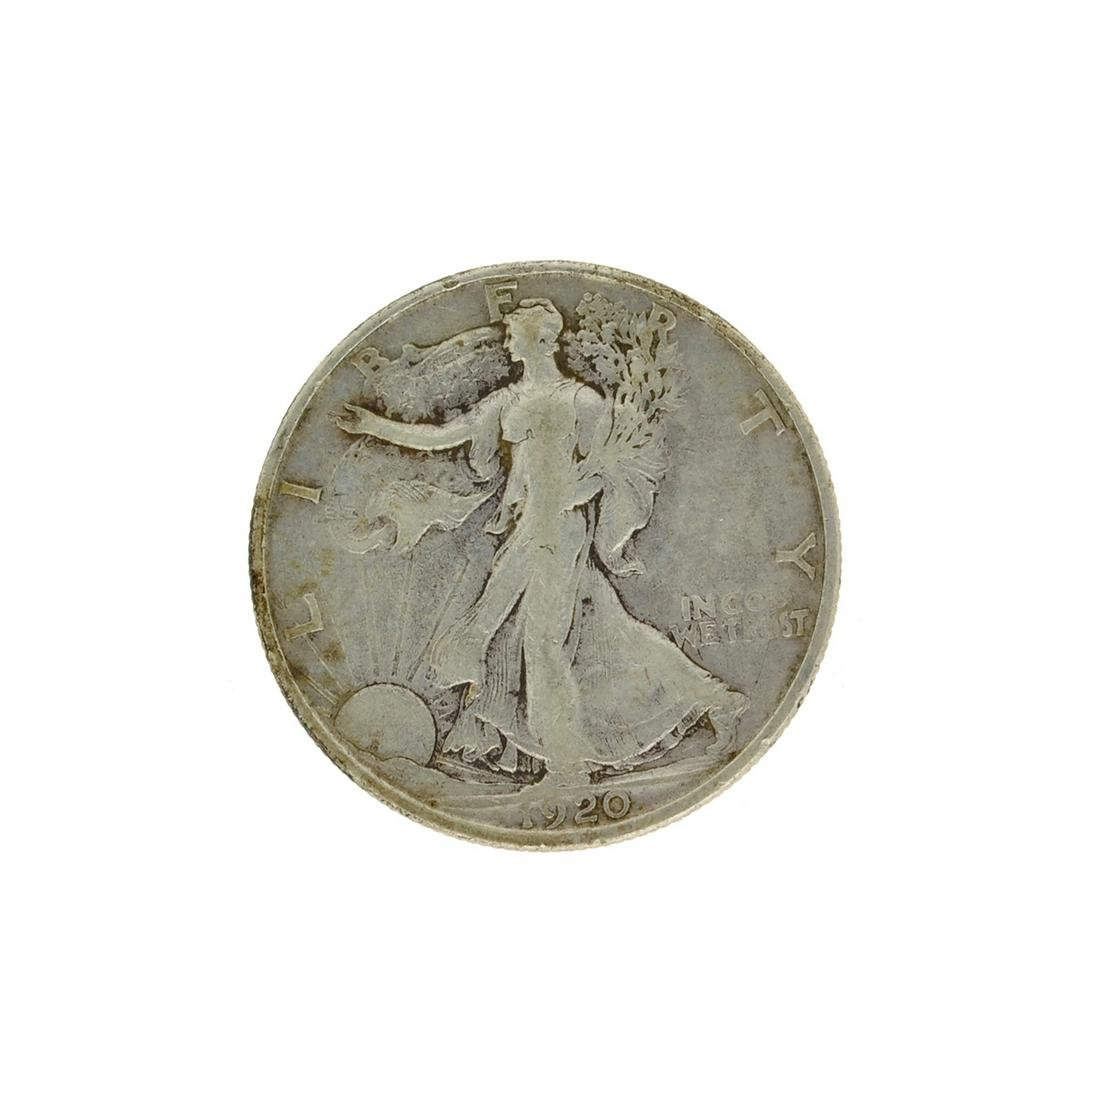 1920-S Walker Half Dollar Coin